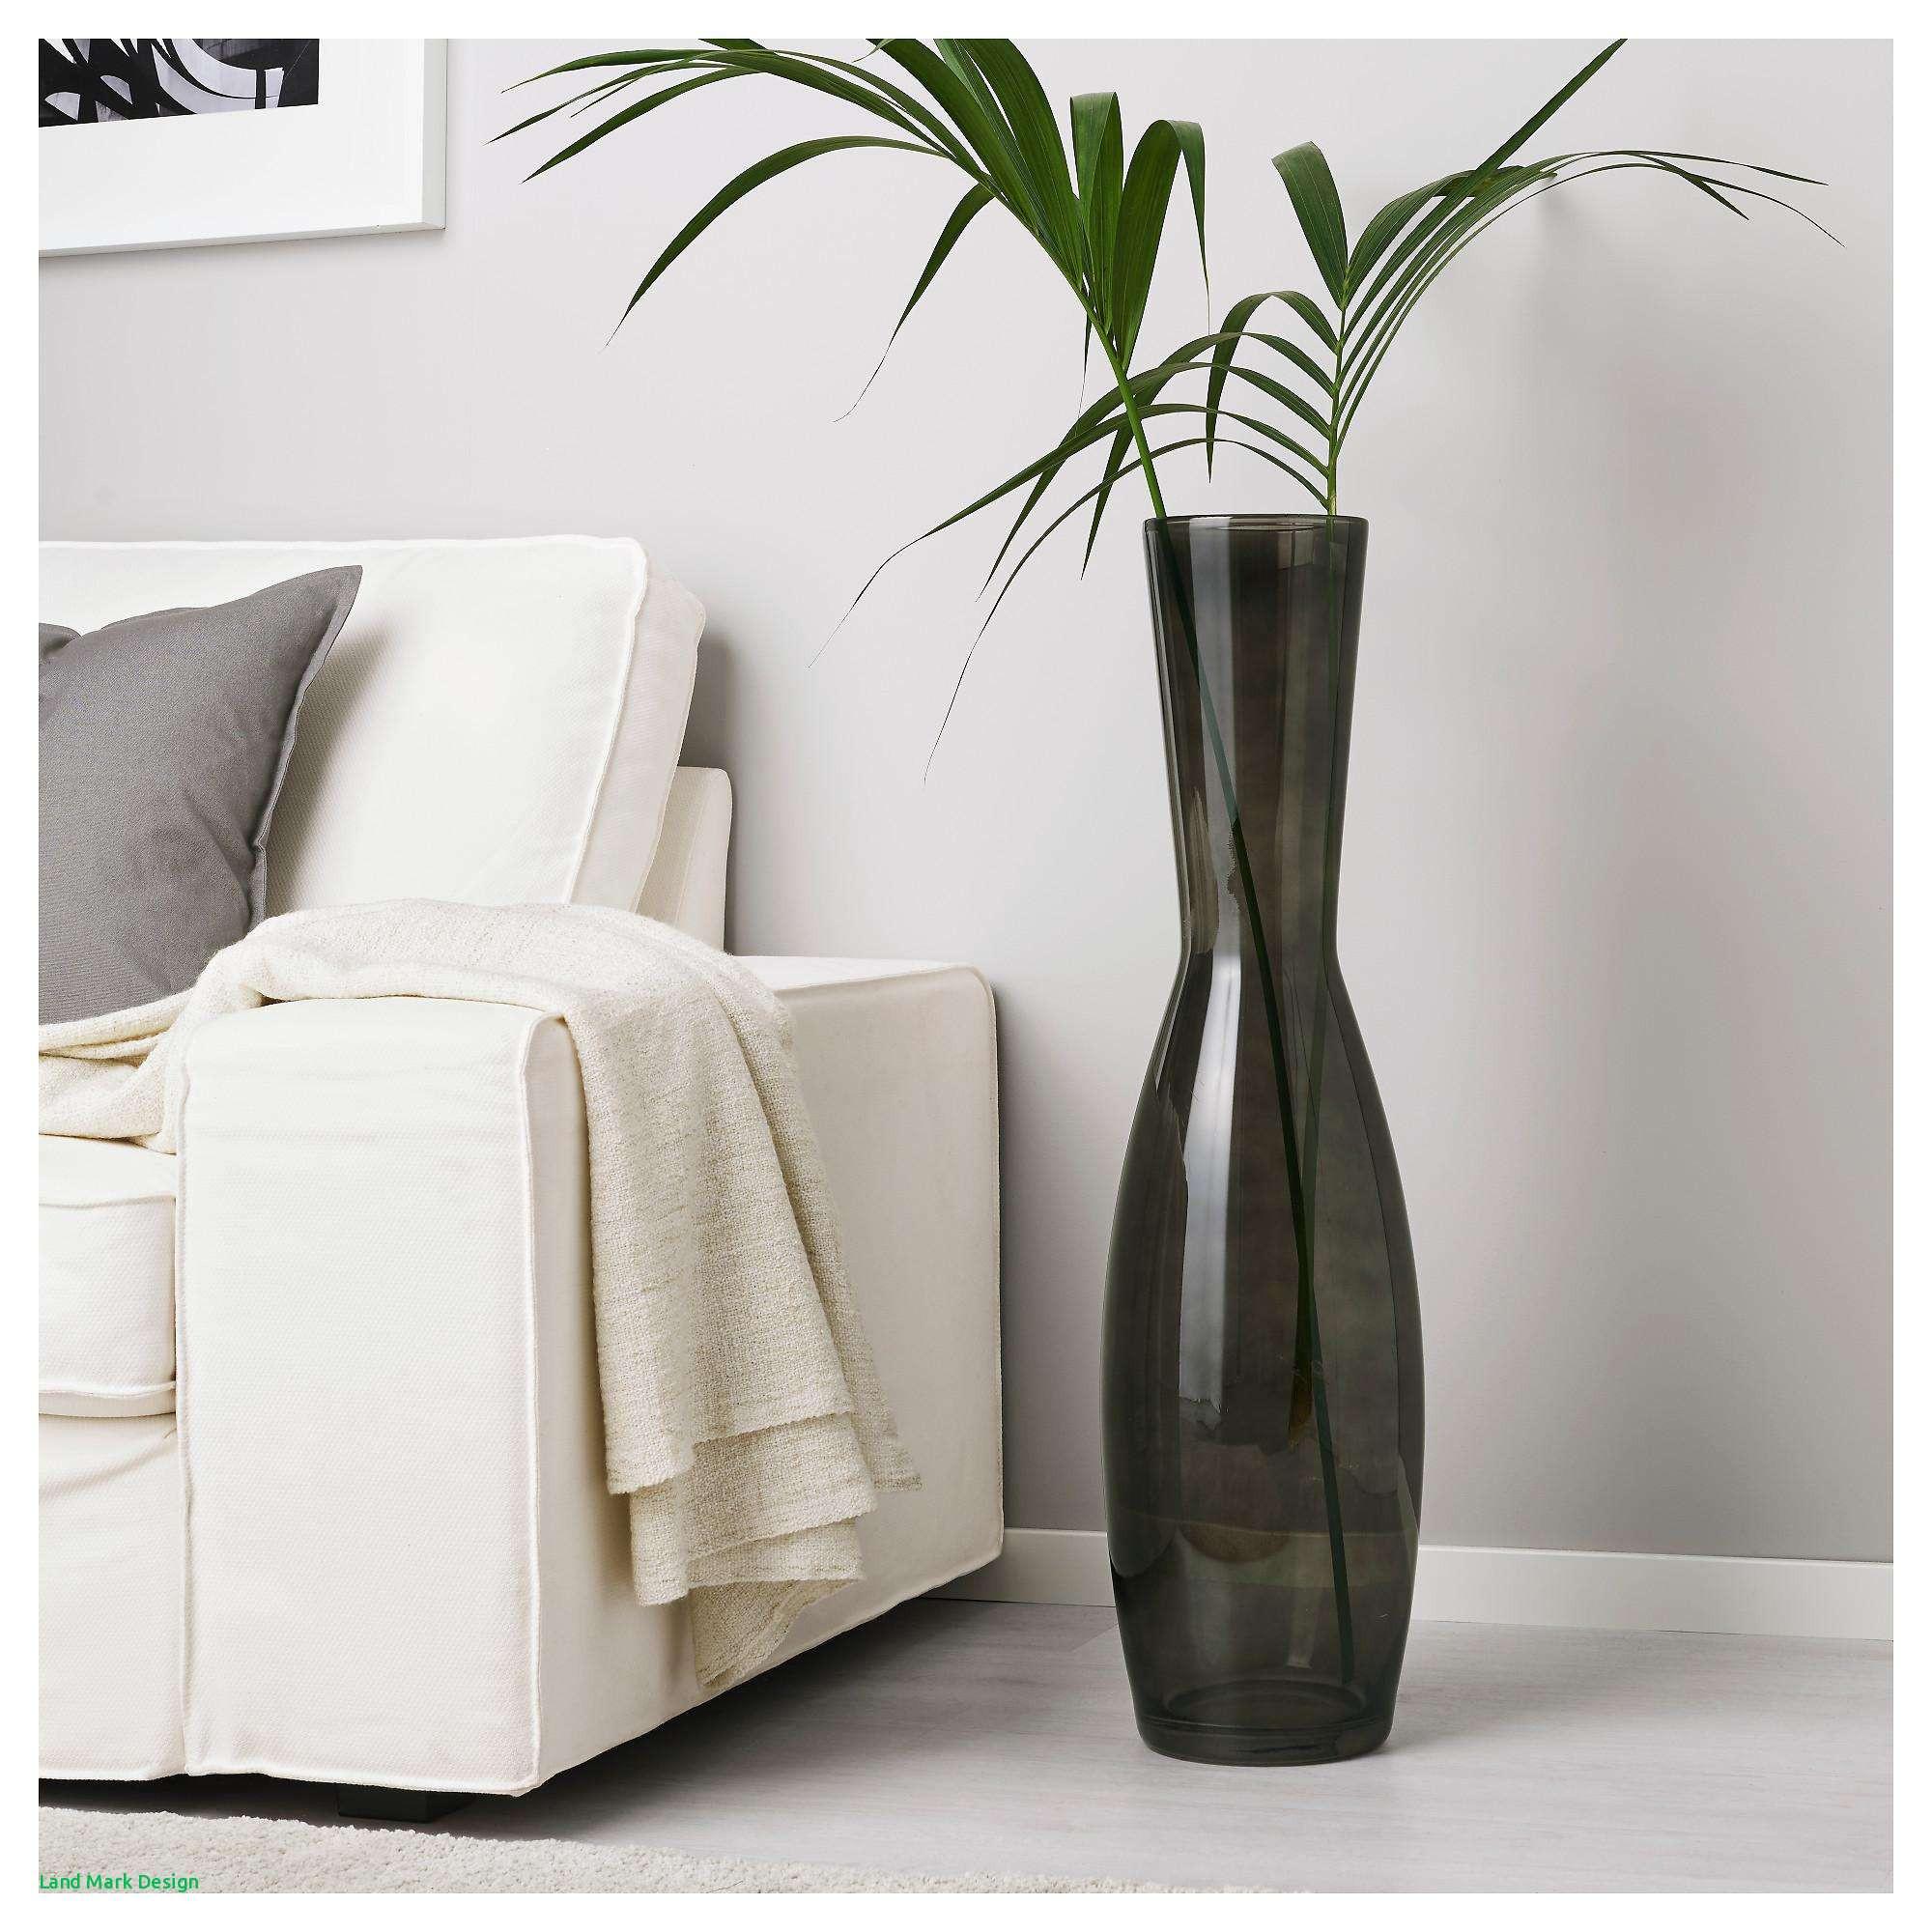 lenox heart vase of brown floor vase image decorative floor vases fresh d dkbrw 5749 1h inside brown floor vase stock corner vase of brown floor vase image decorative floor vases fresh d